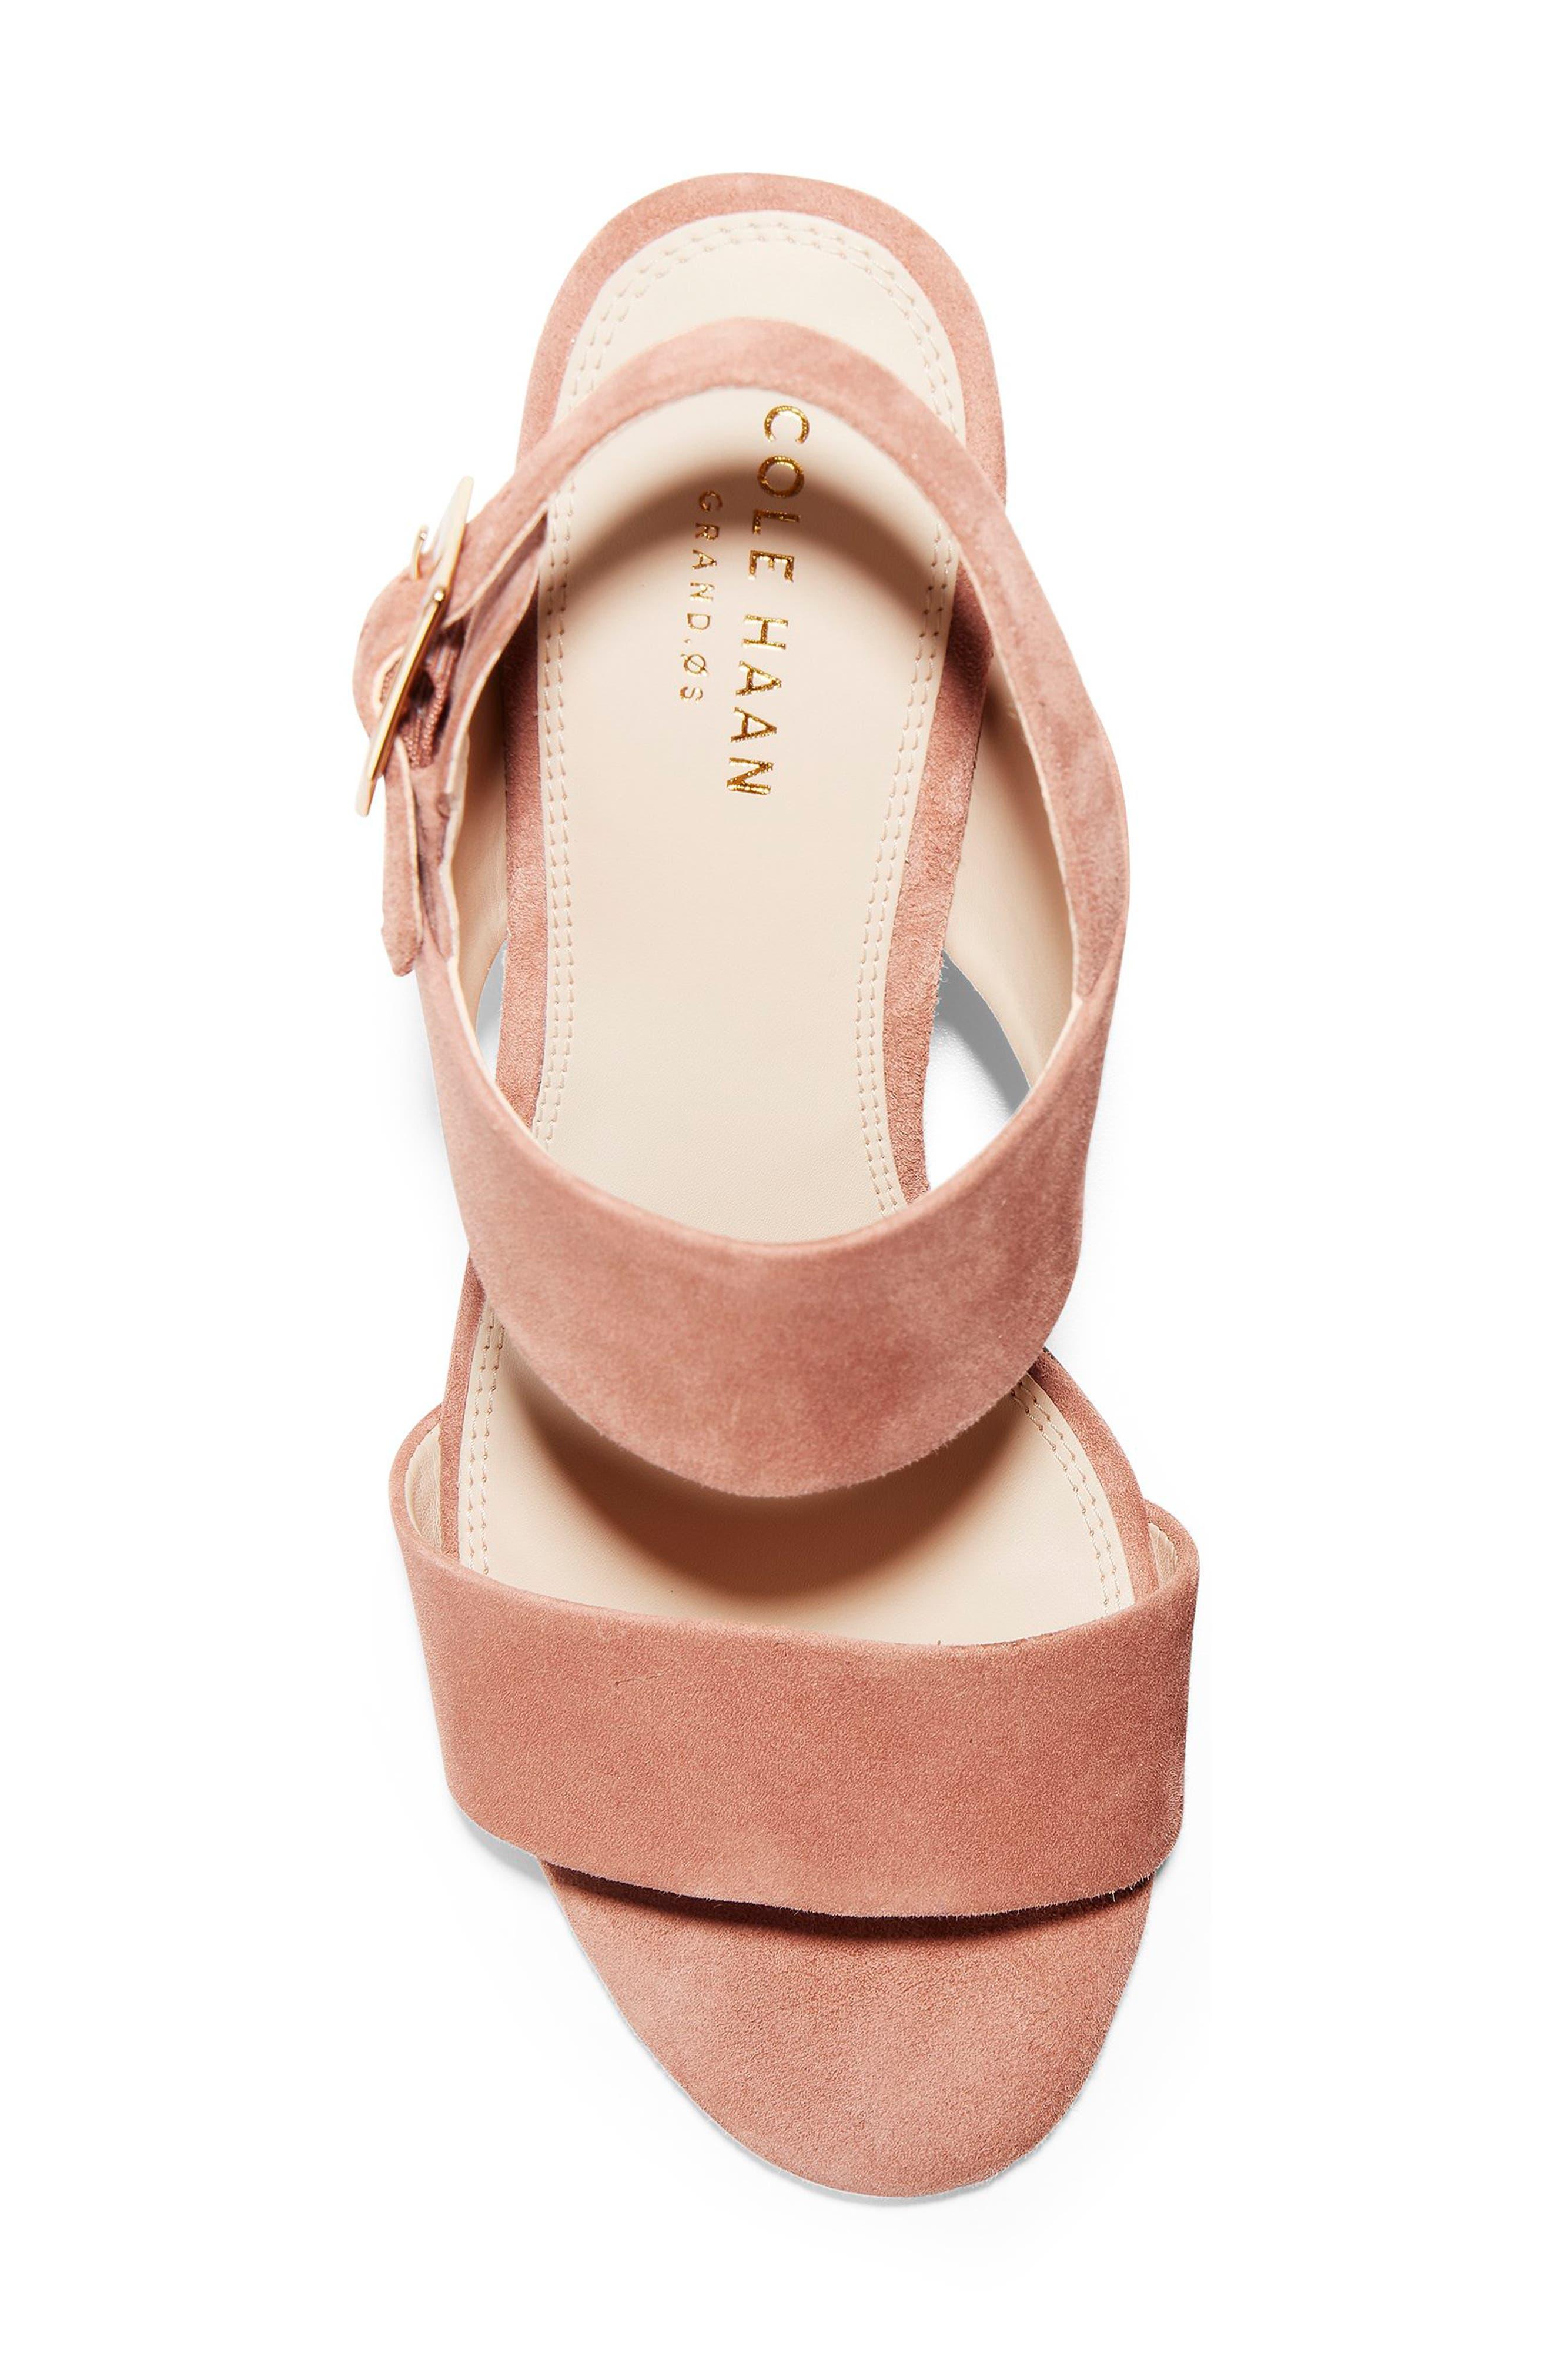 Avani Block Heel Sandal,                             Alternate thumbnail 5, color,                             MOCHA MOUSSE SUEDE